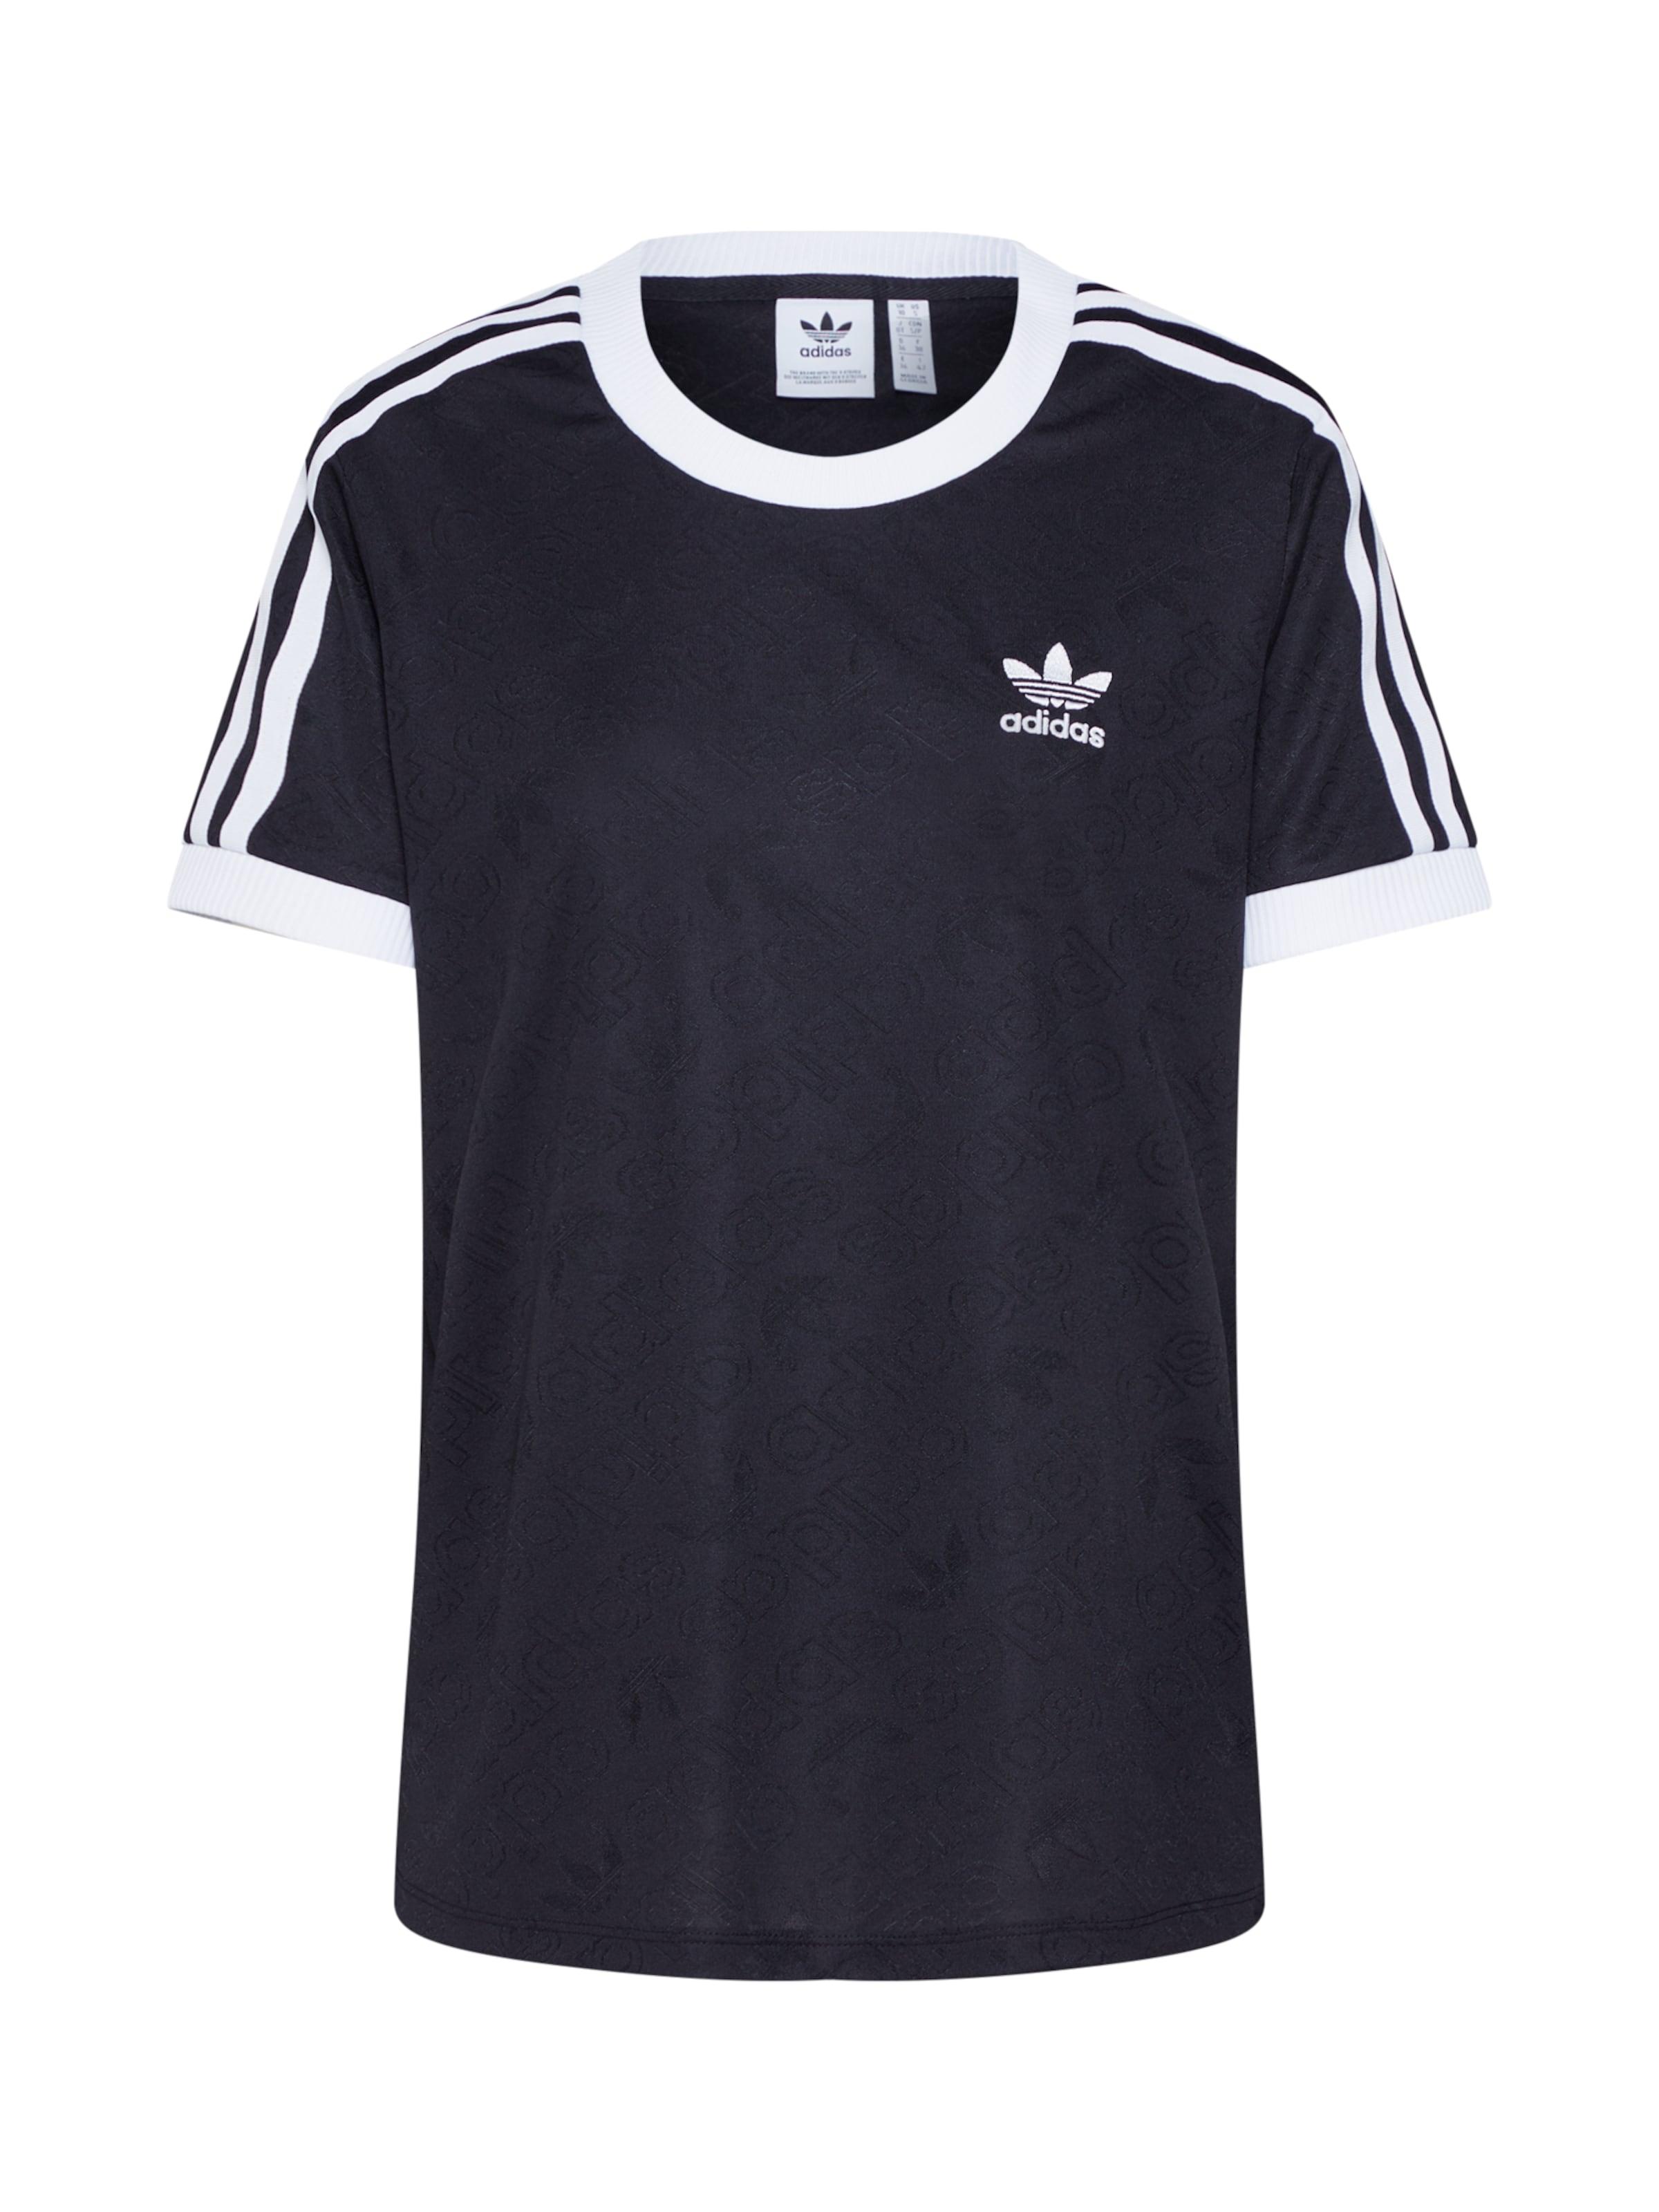 NoirBlanc Adidas shirt En stripes' T Originals '3 wn80vmN